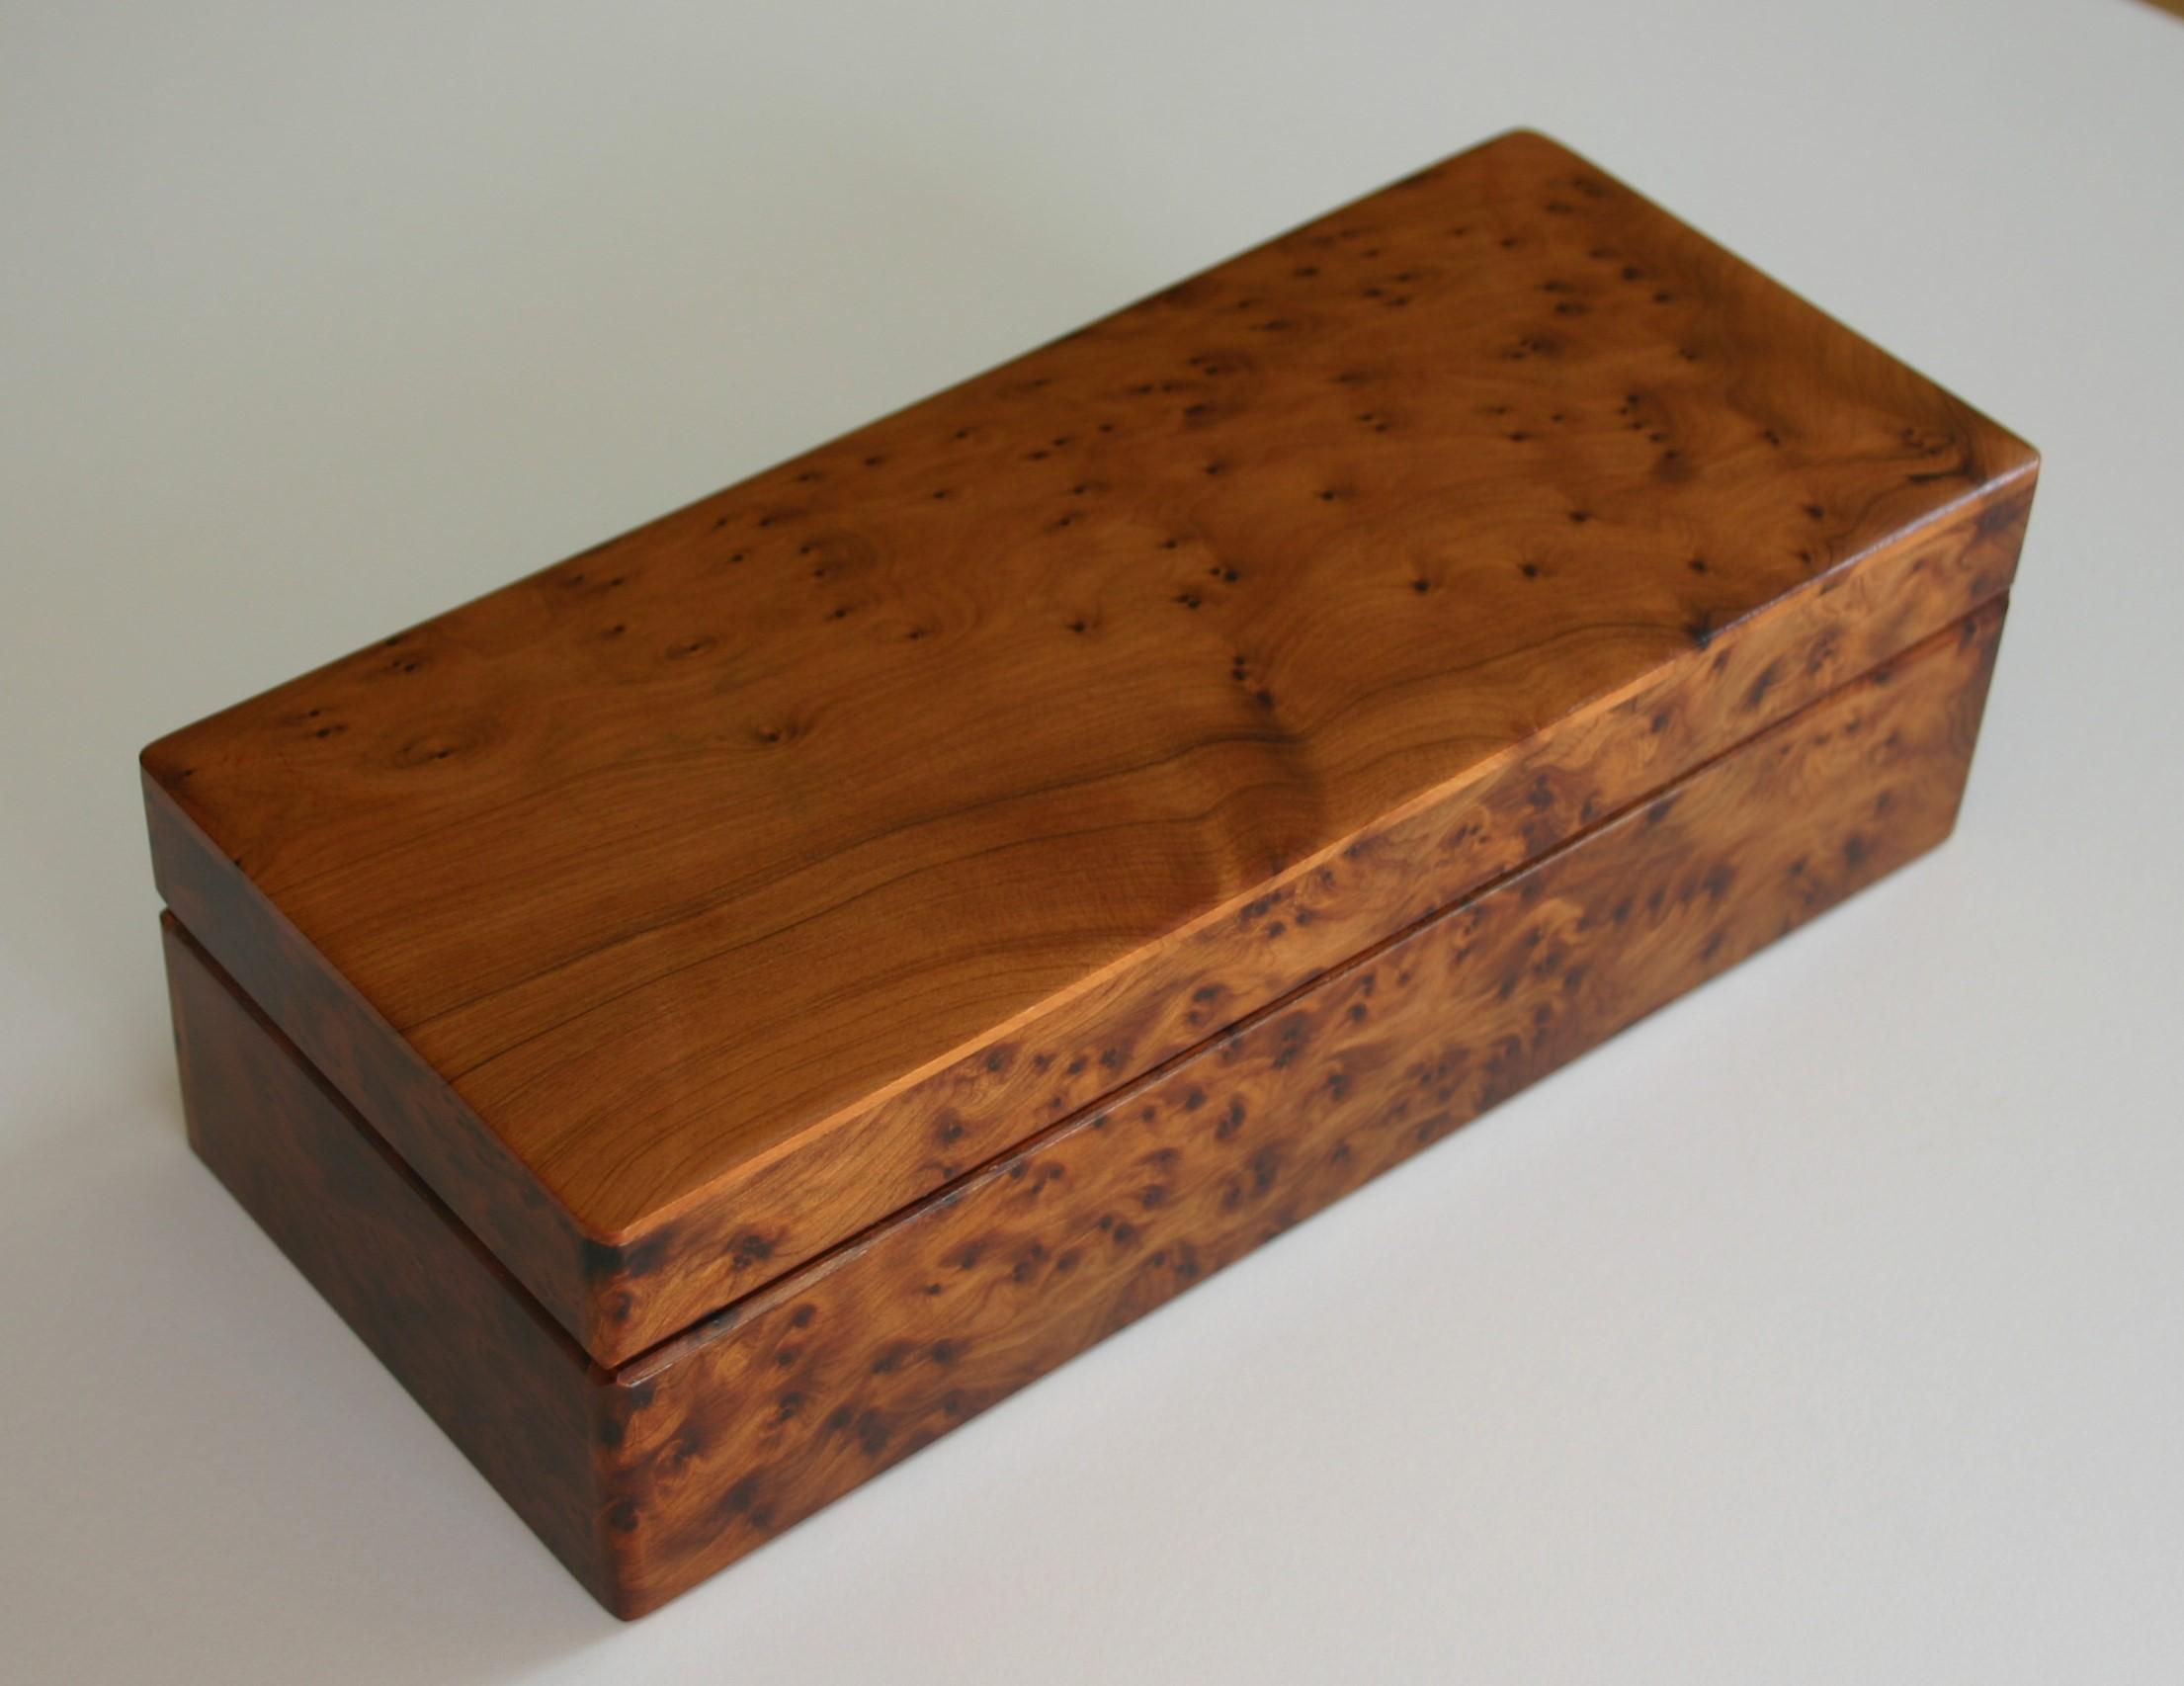 Wooden presentation box - Trinitybox